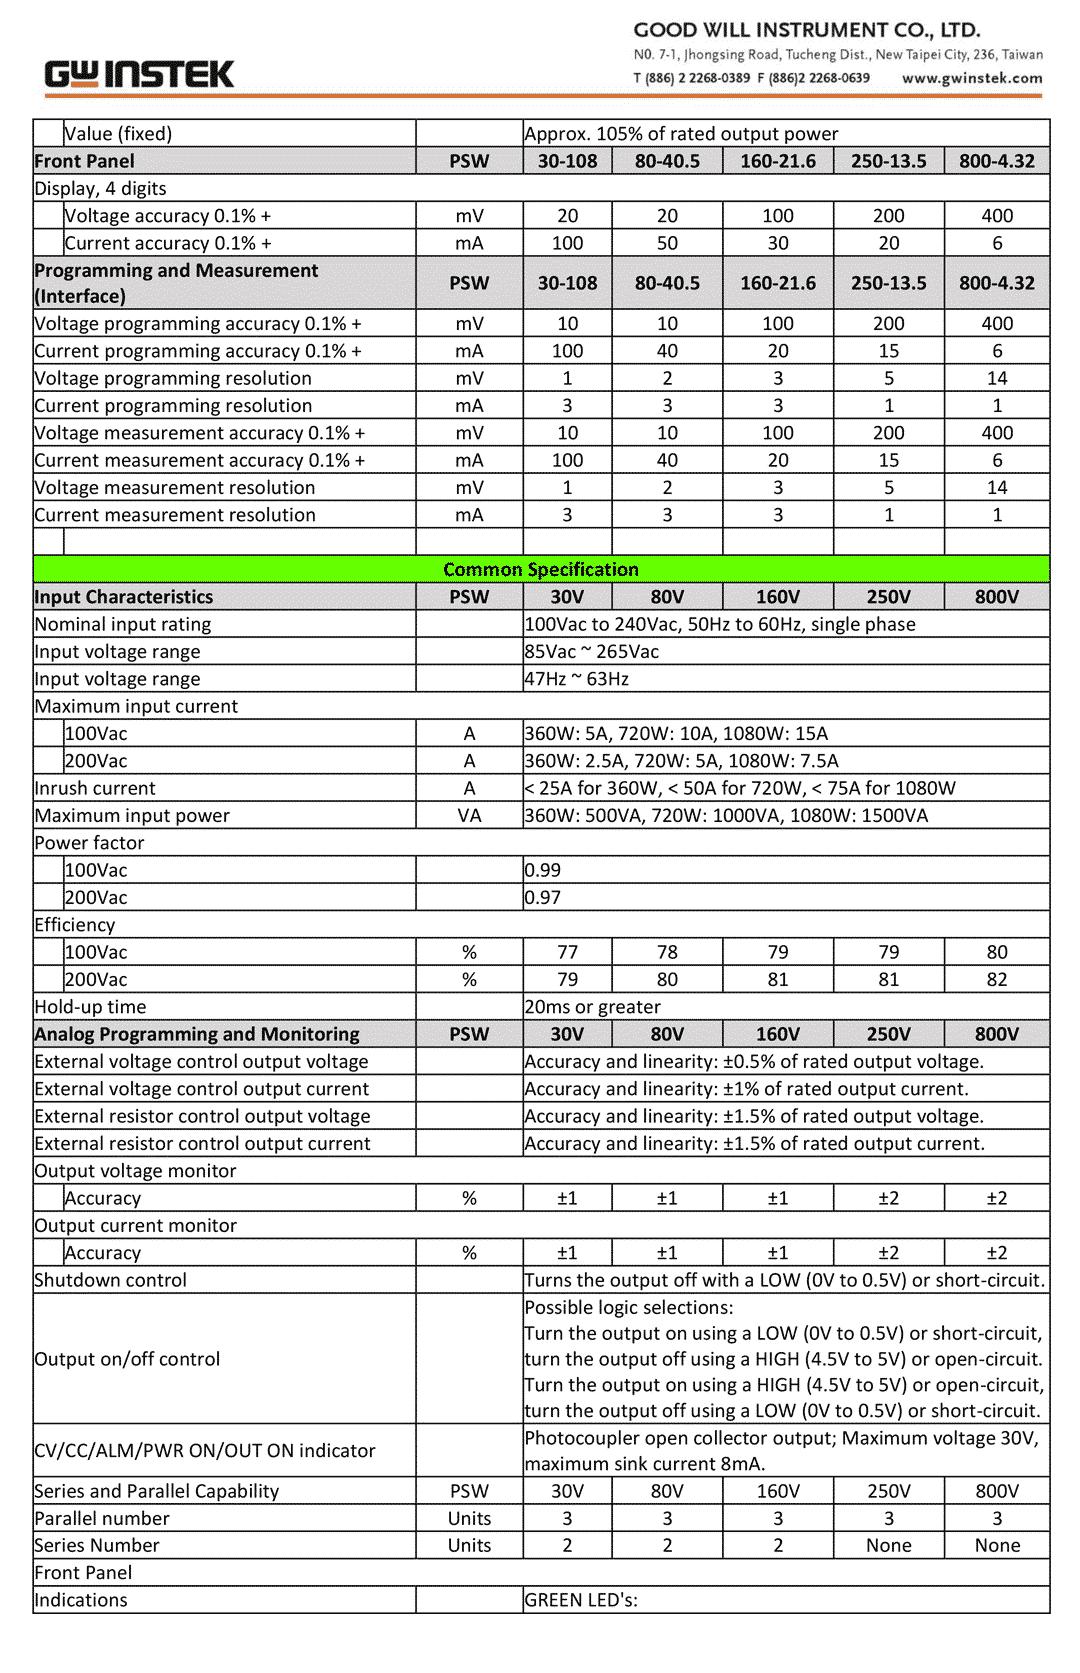 Spec GW Instek PSW 80-40.5-1